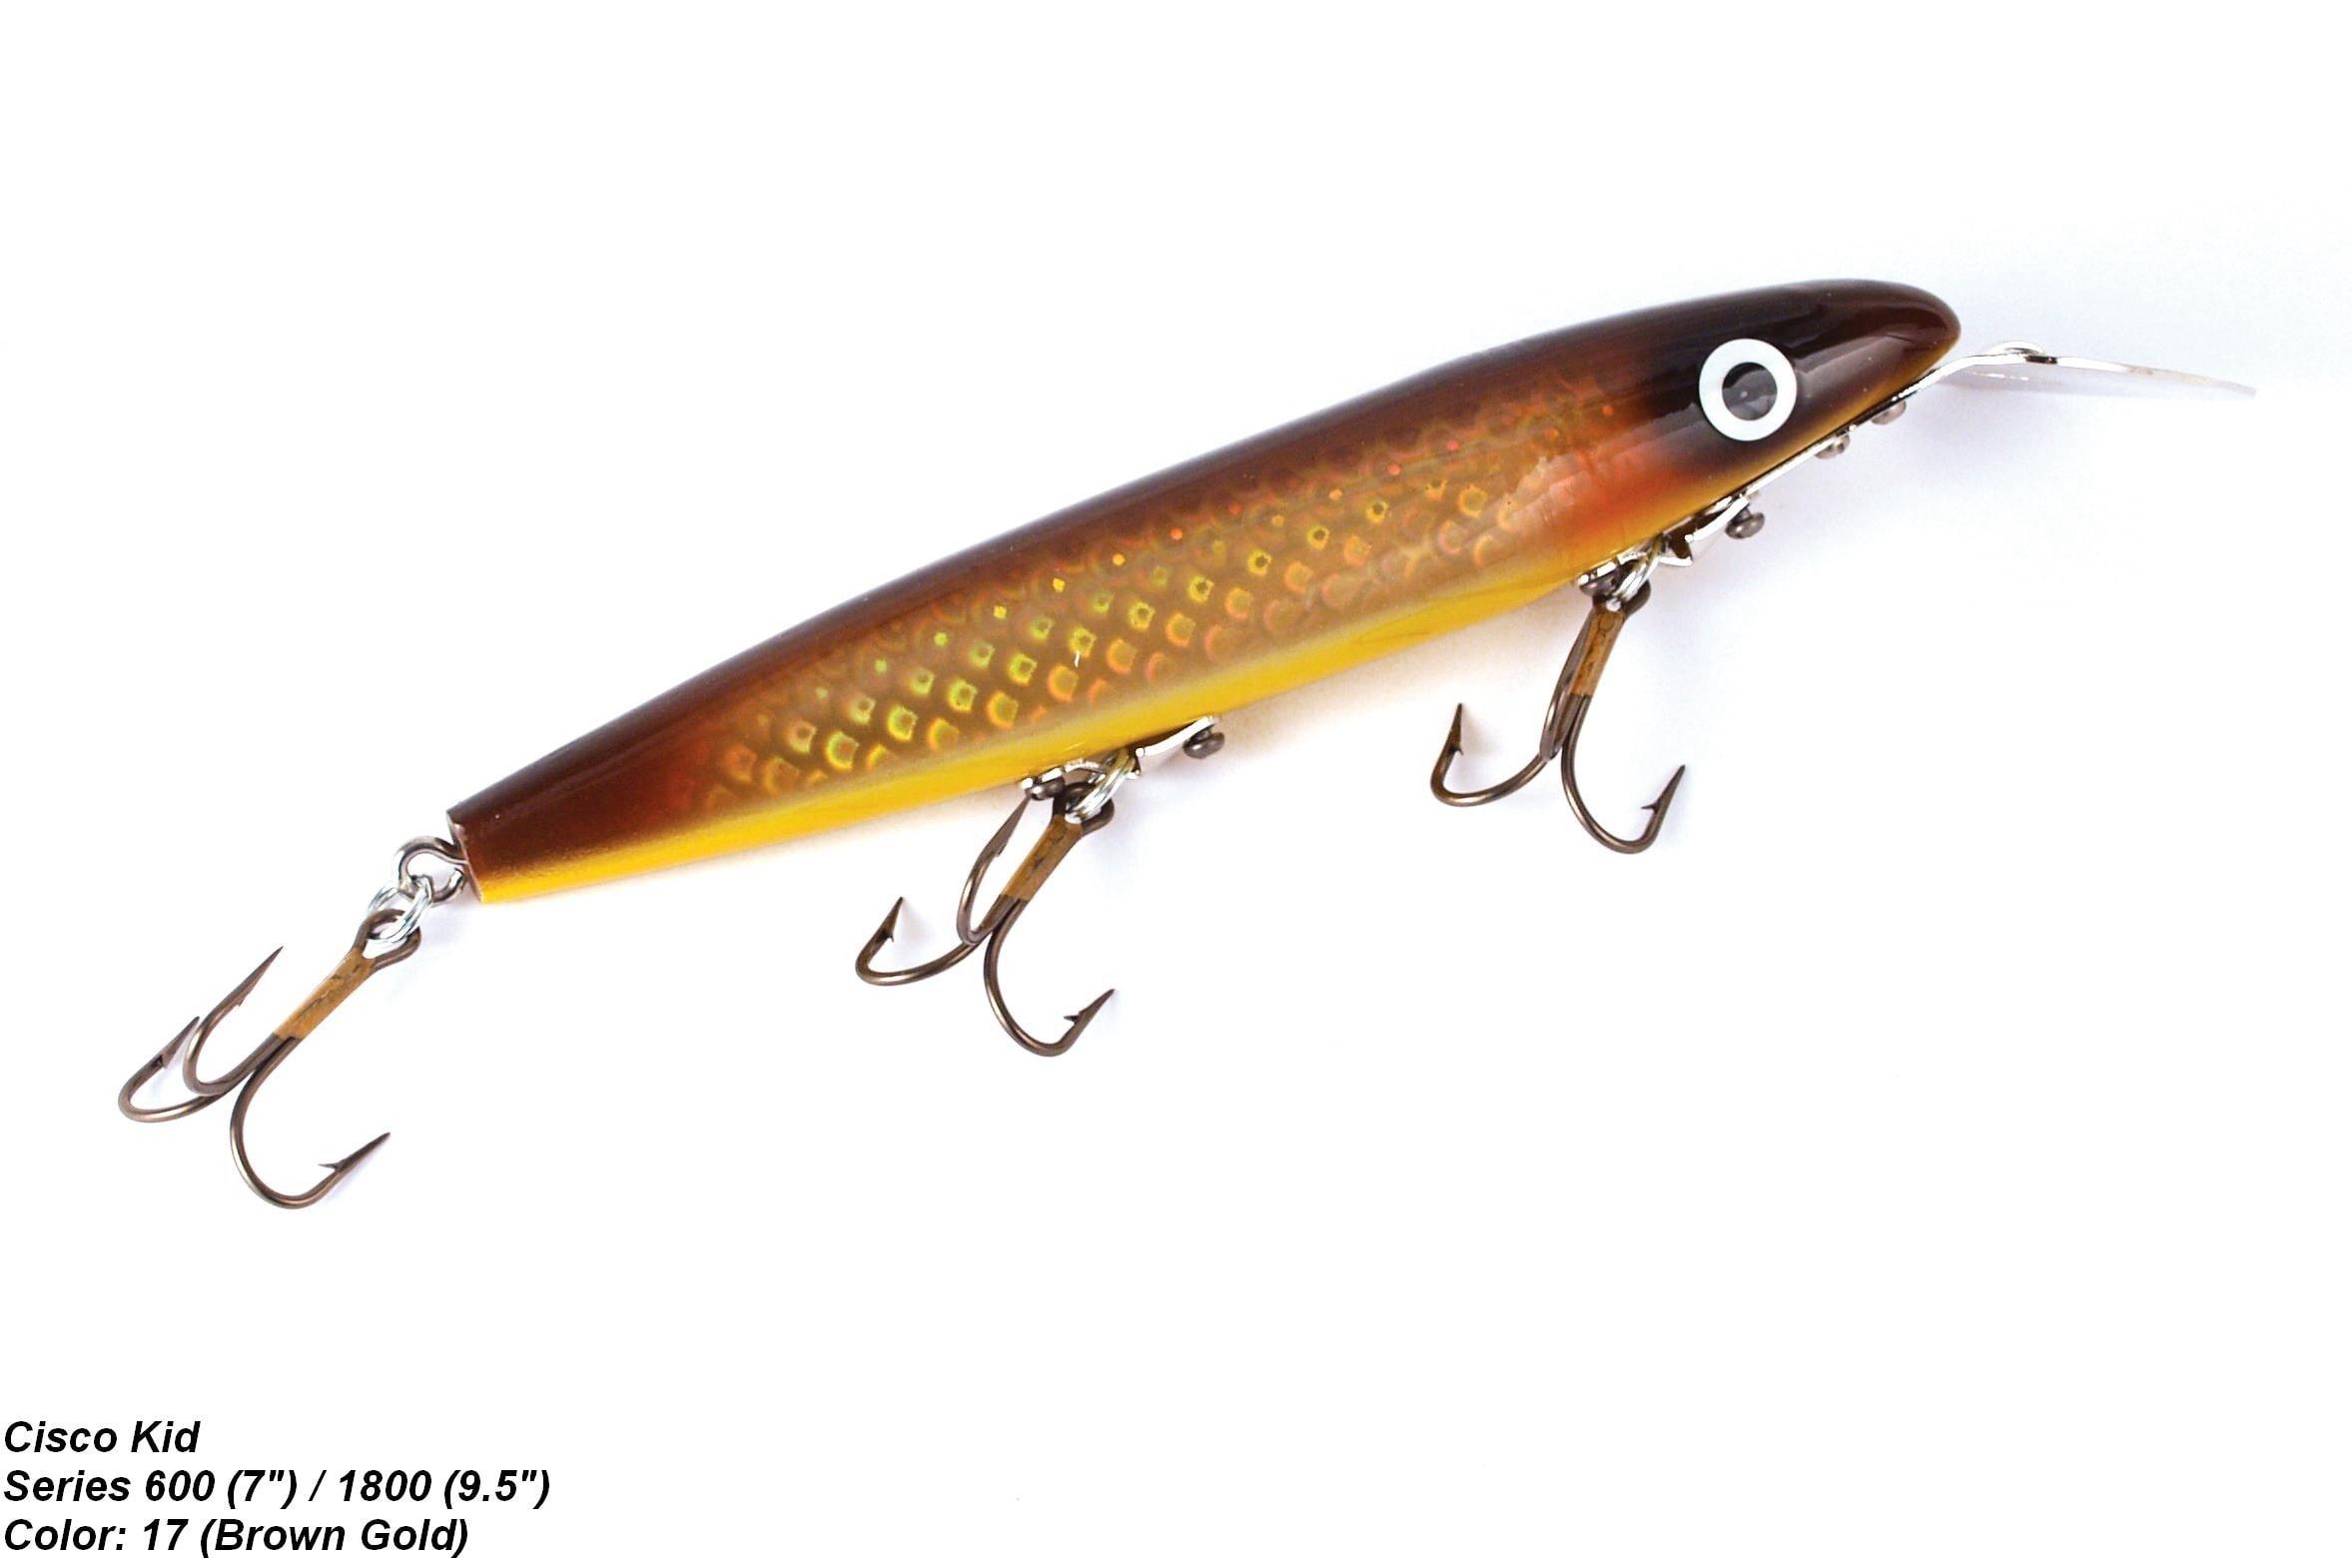 Husky 600 Series Cisco Kid [Brown/Gold]